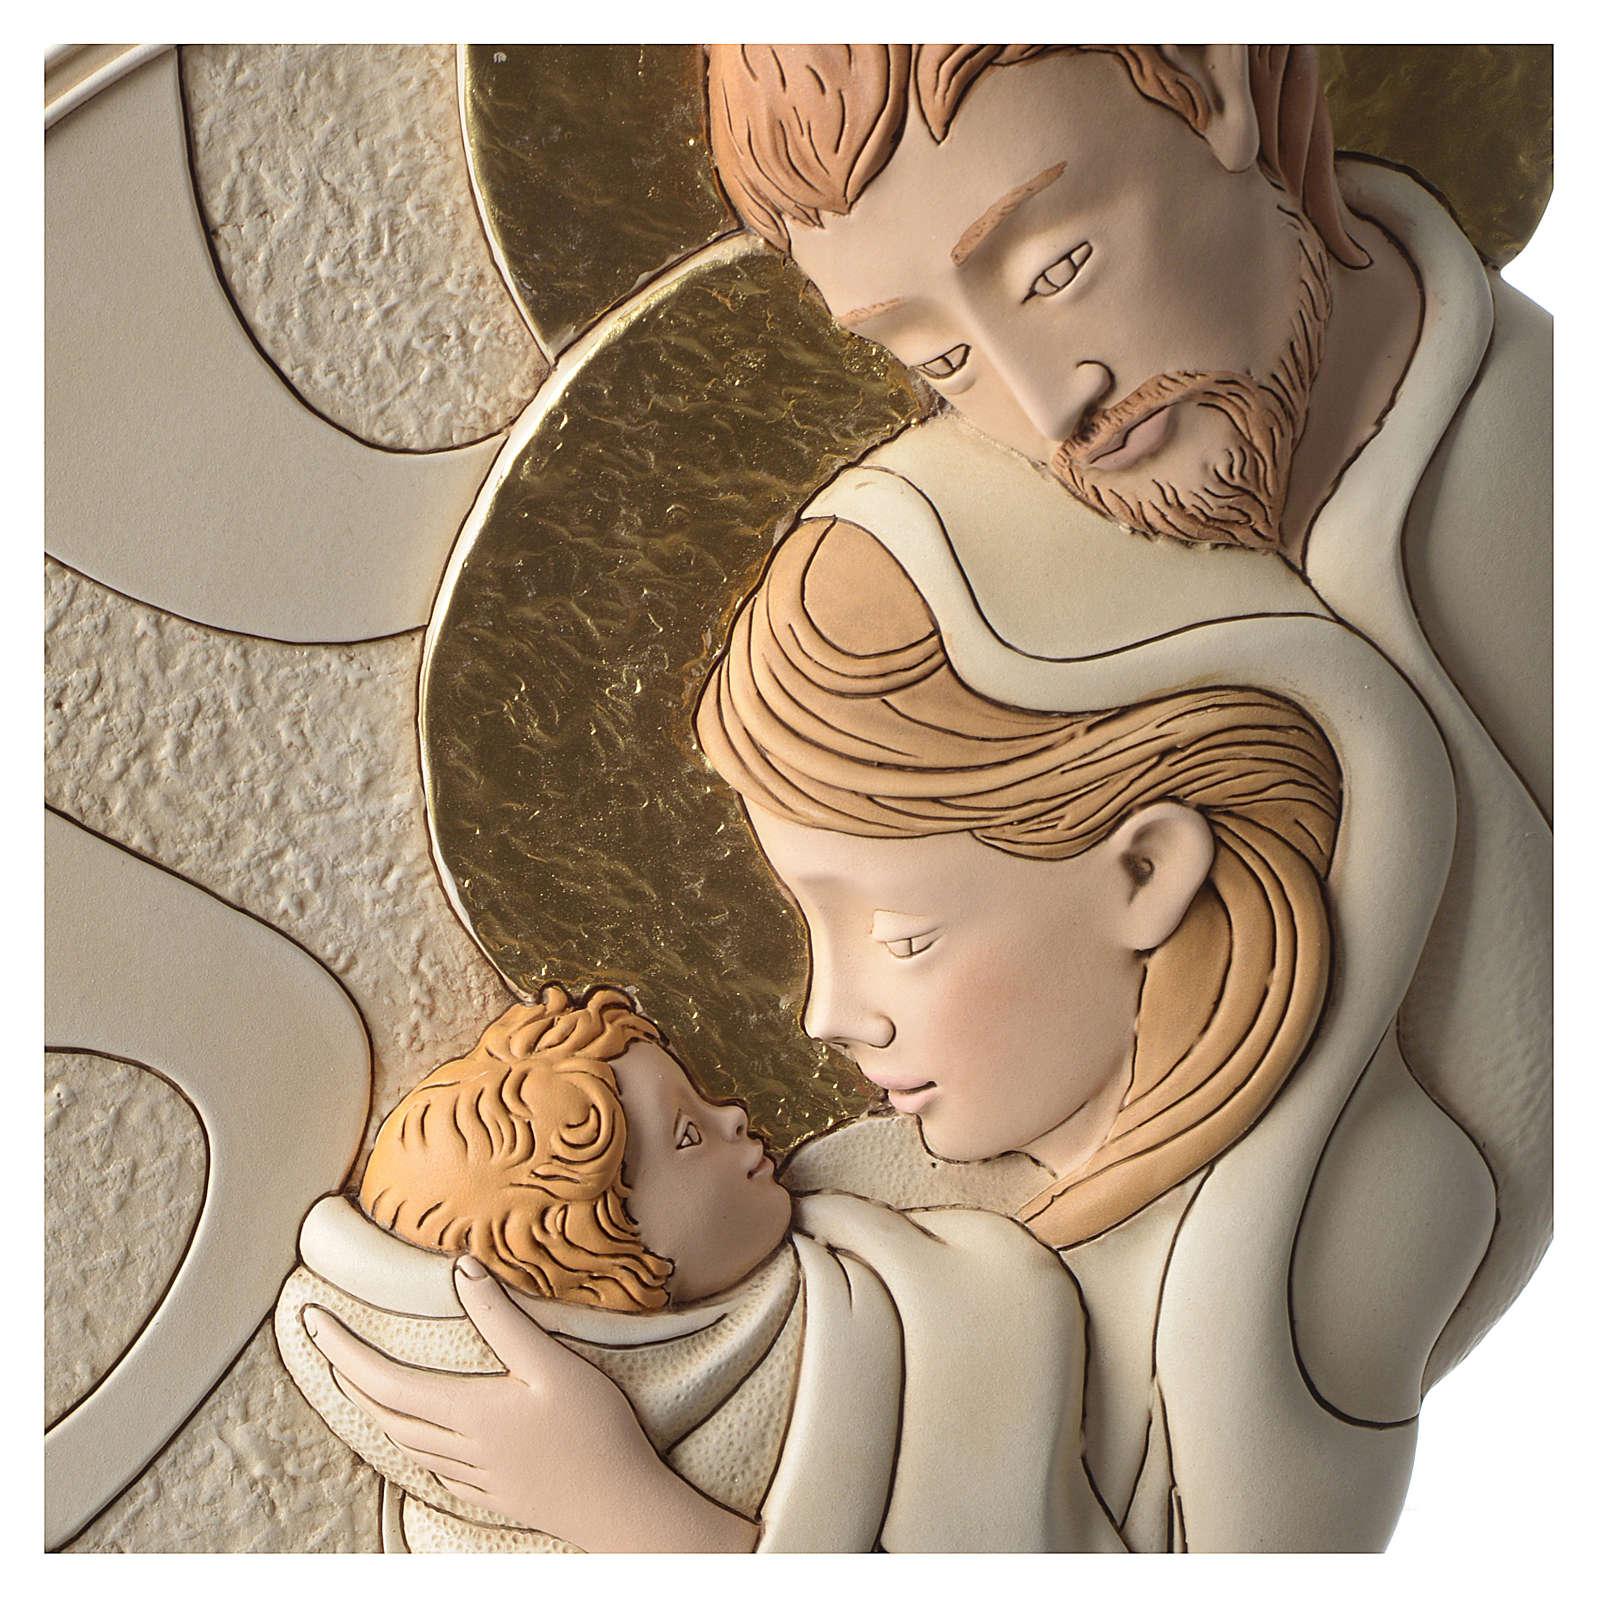 Baixo-relevo redondo S. Família resina corada detalhes dourados 3